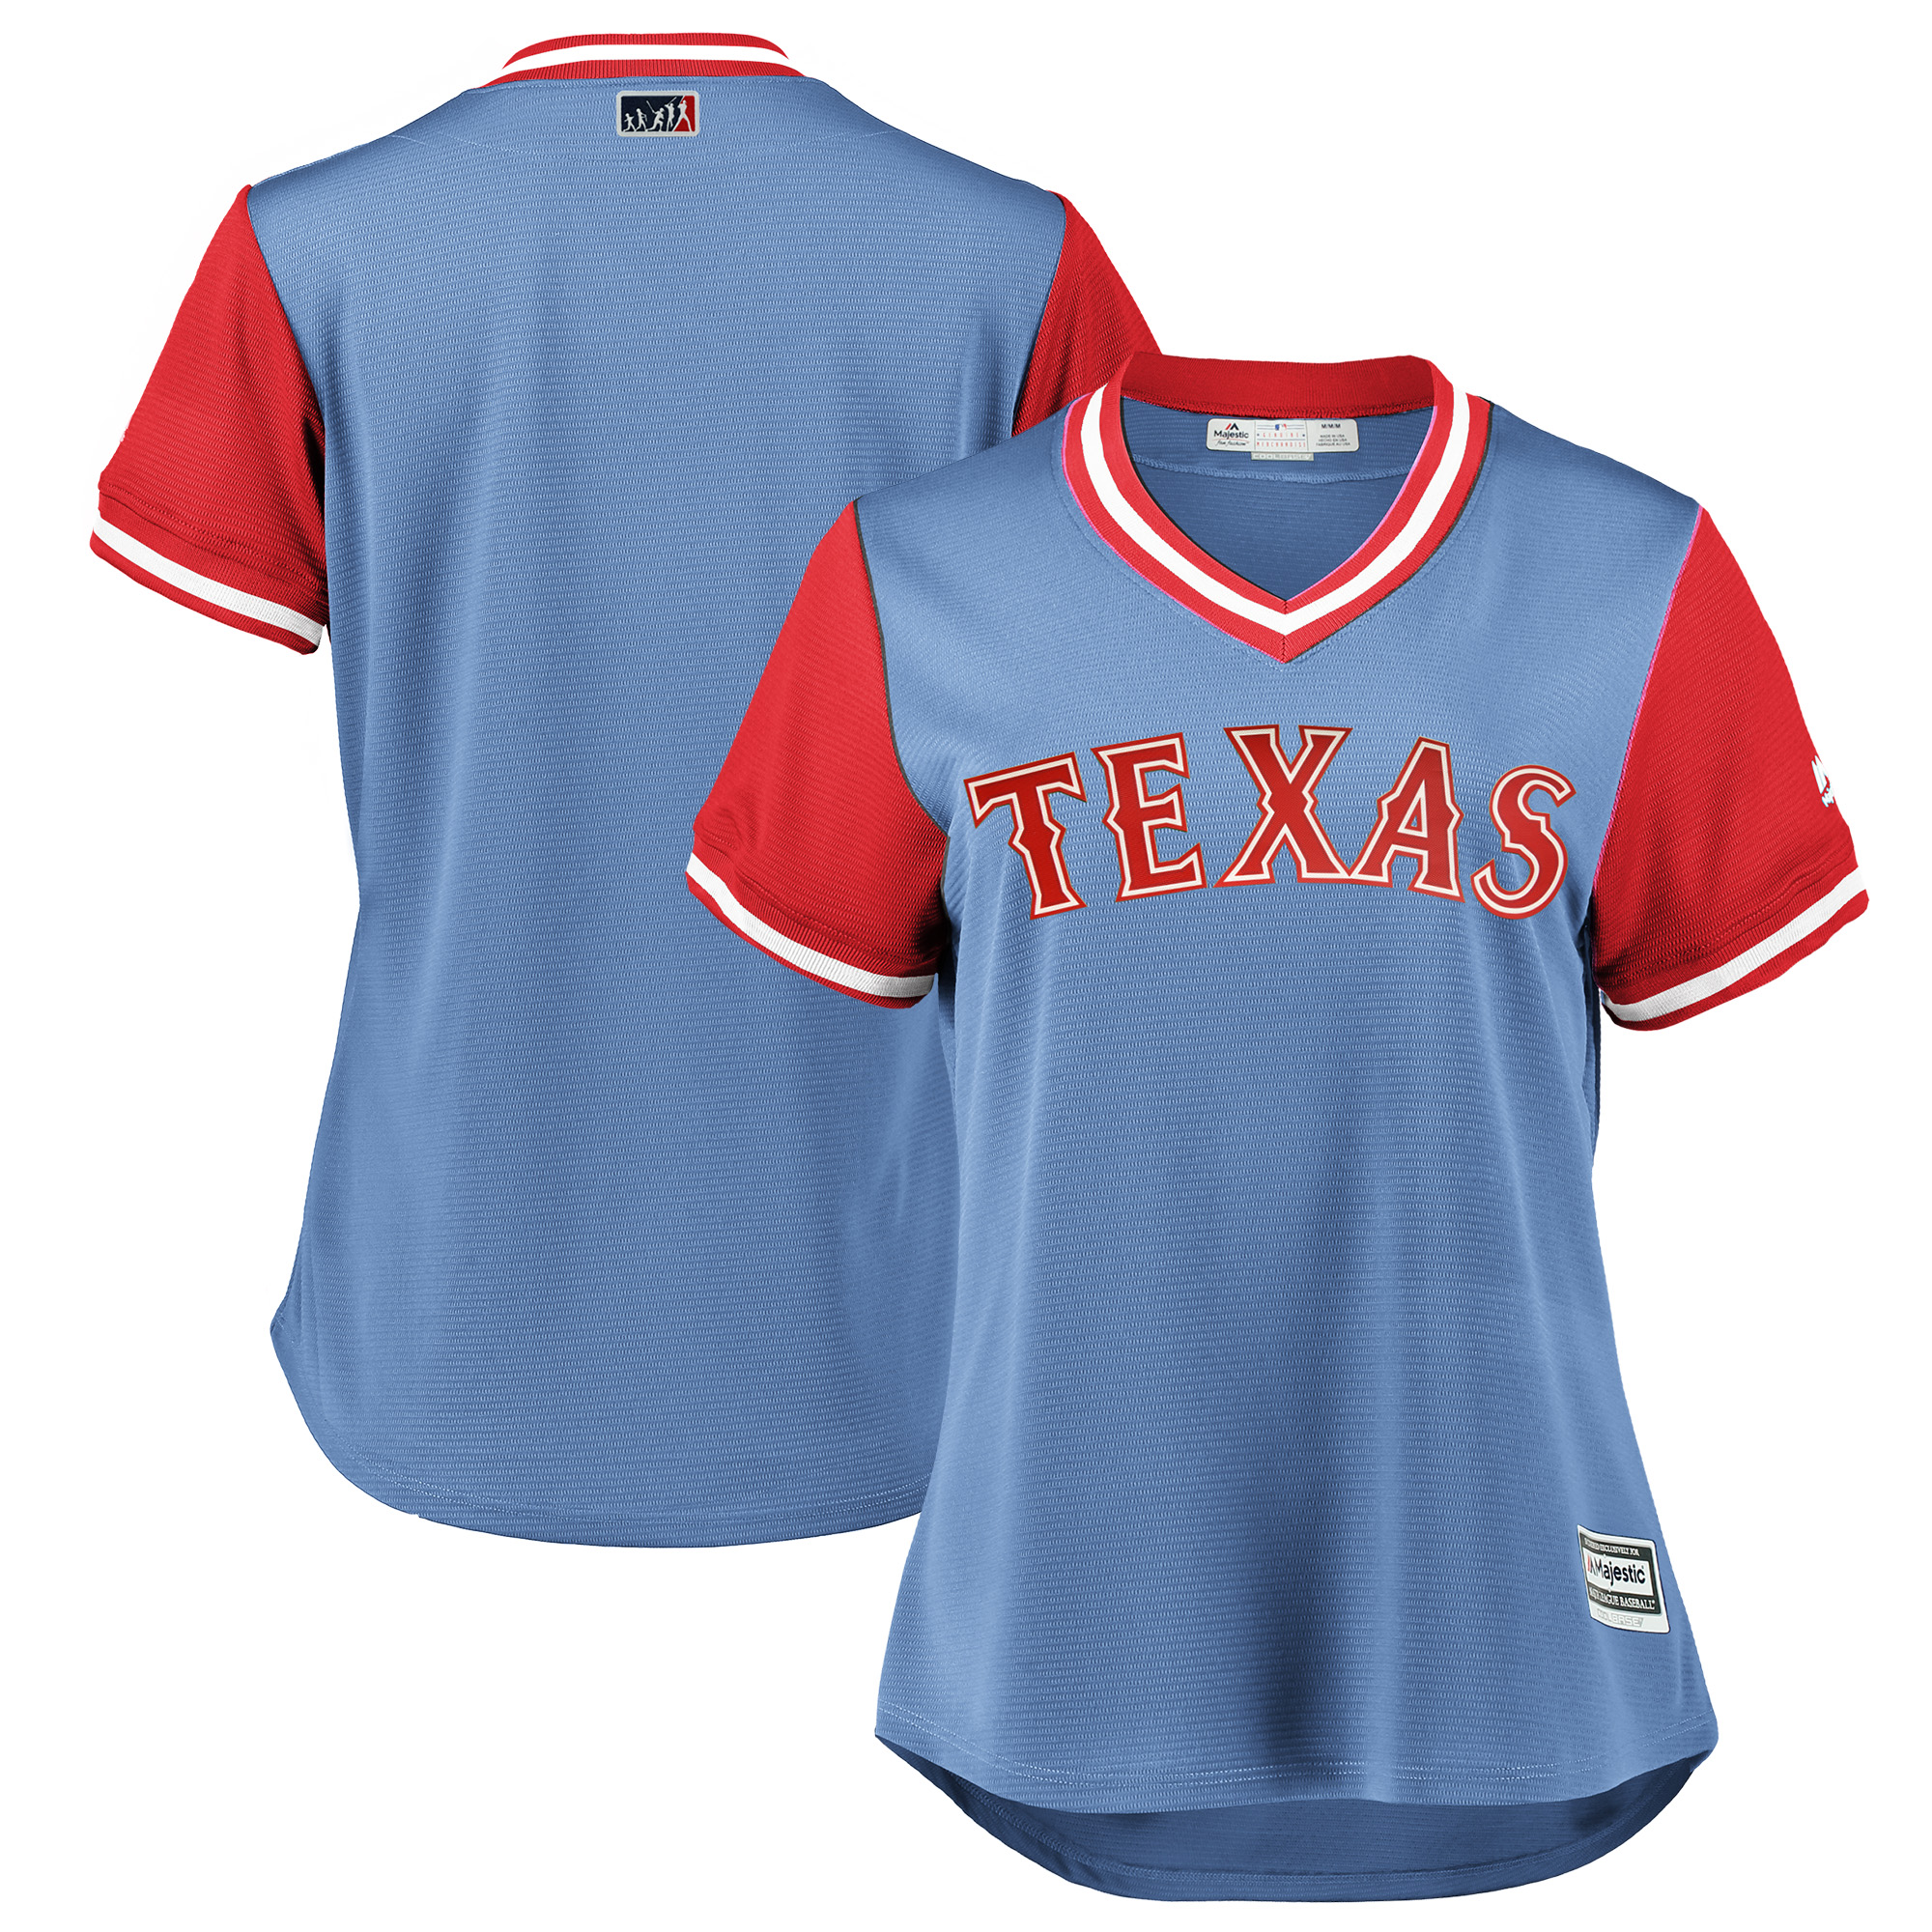 Texas Rangers Majestic Women's 2018 Players' Weekend Team Jersey - Light Blue/Red